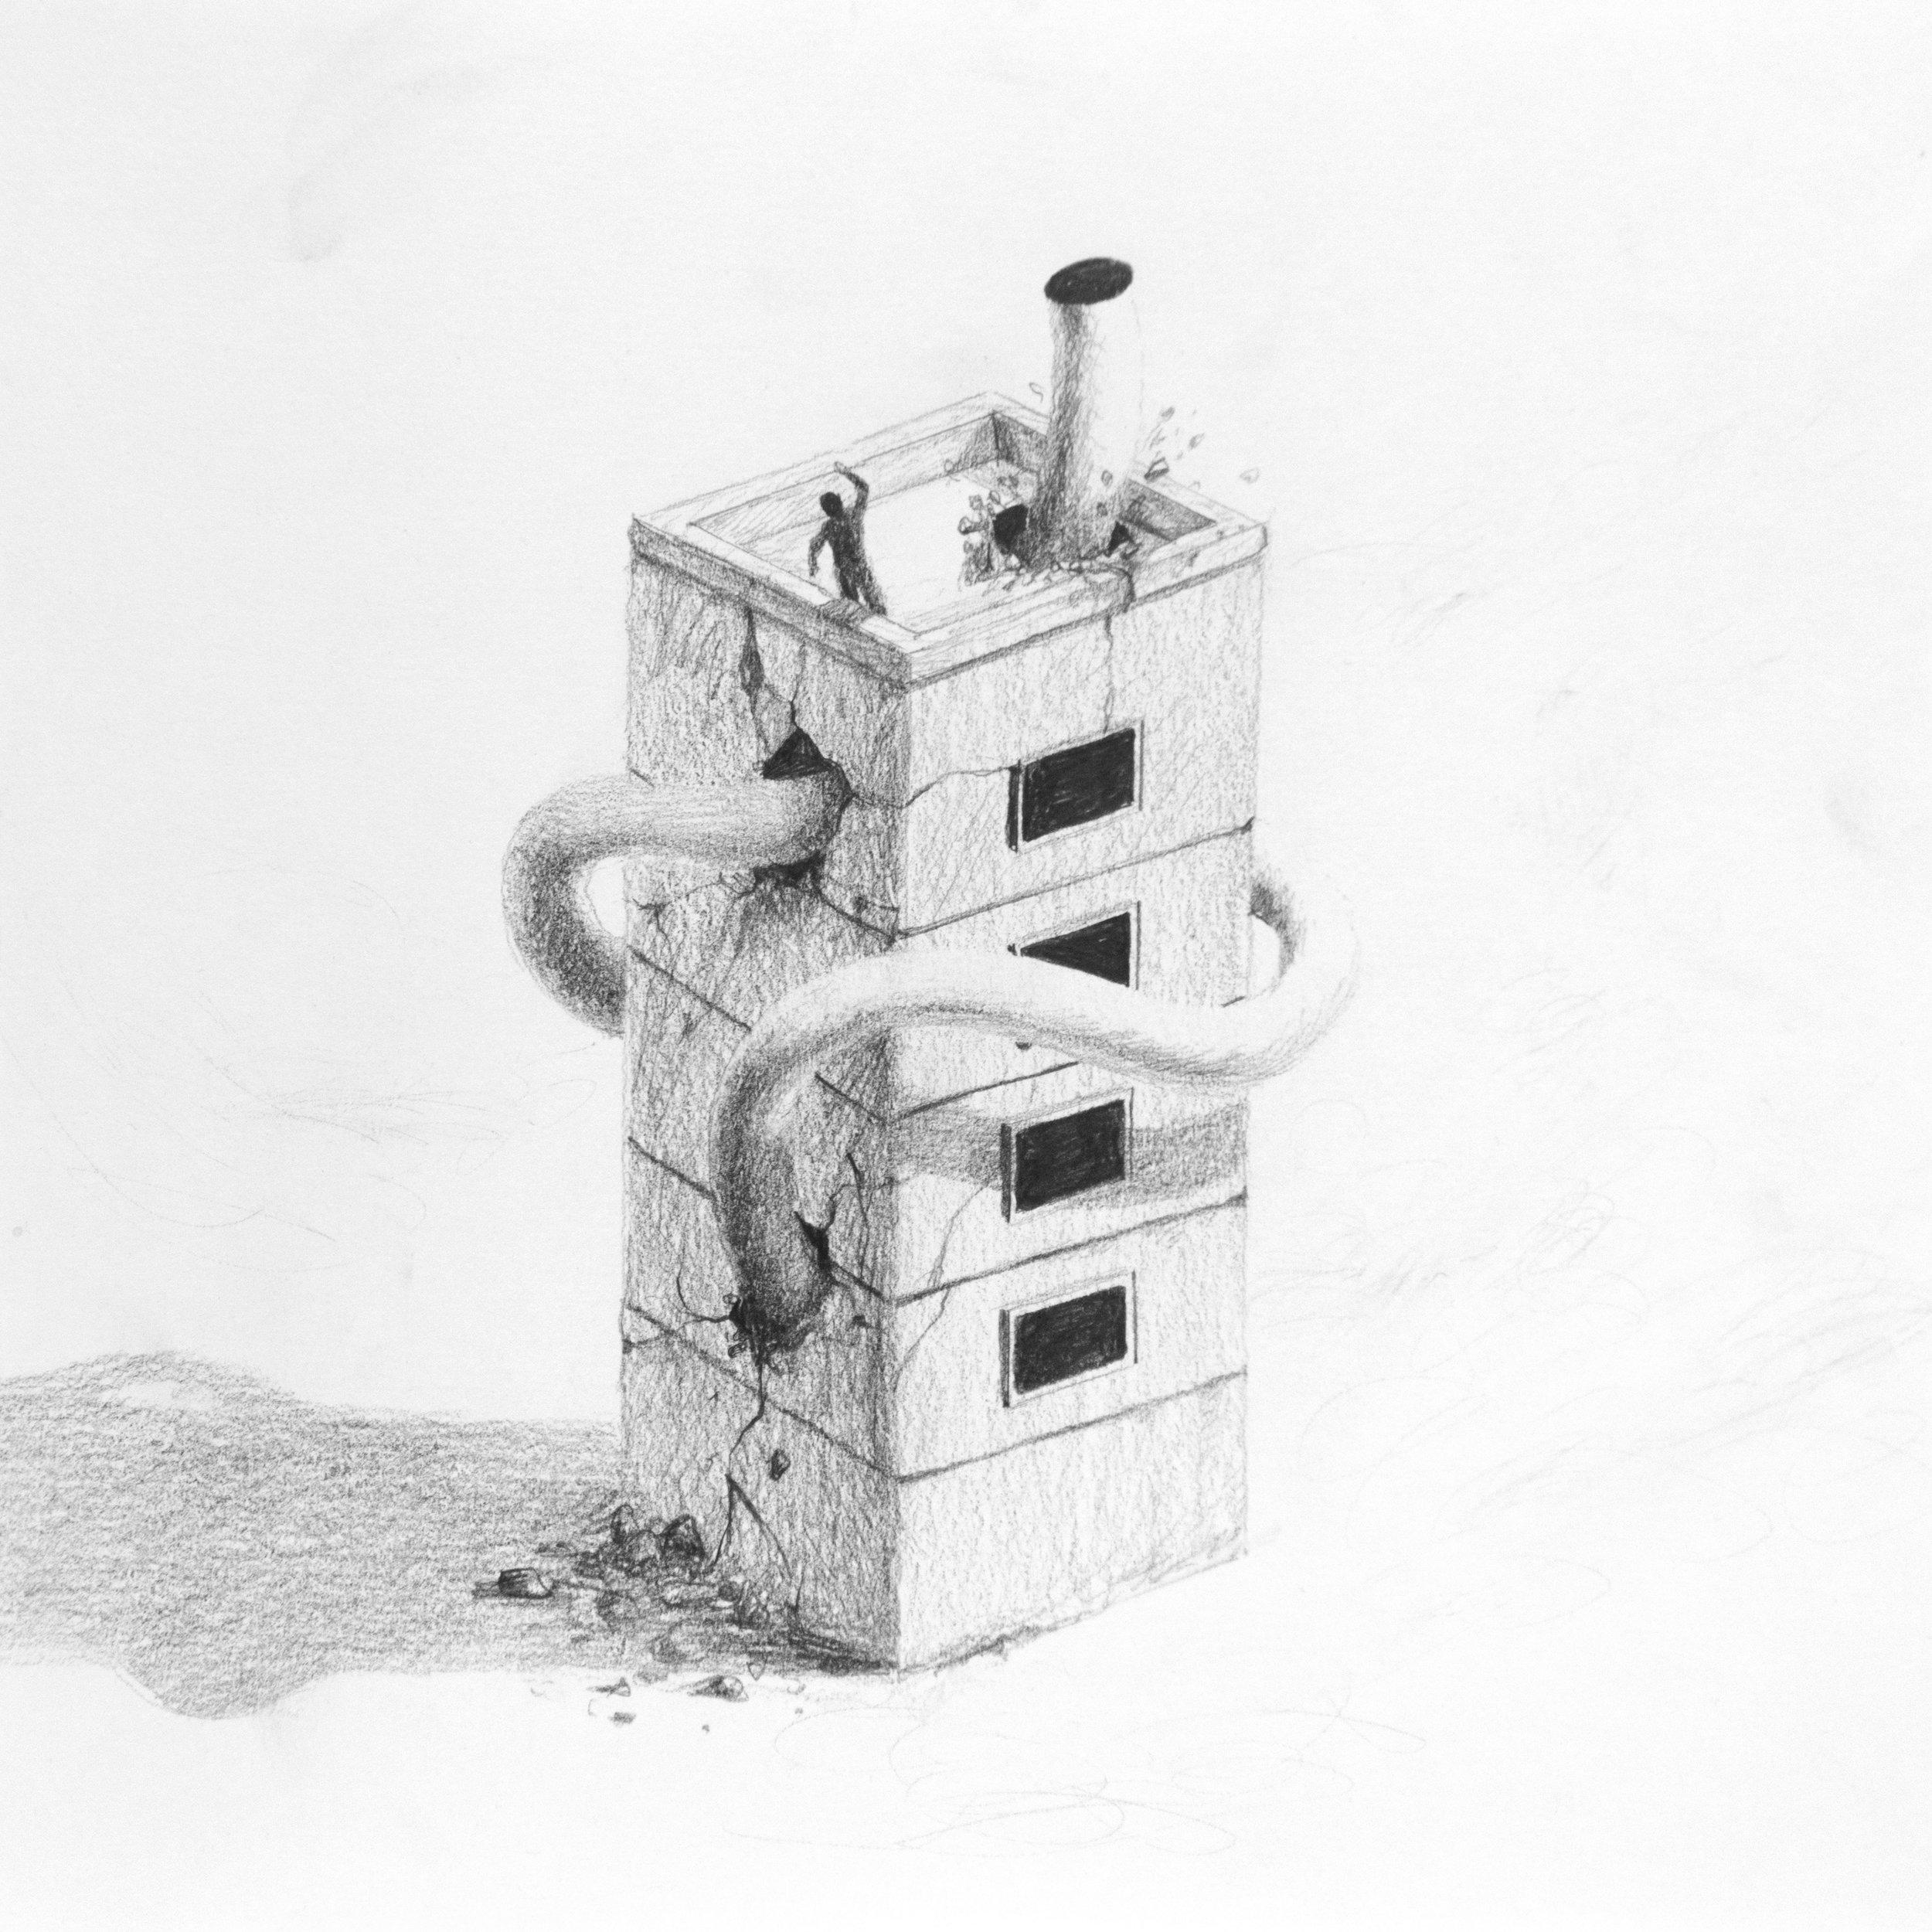 Hamed Sahihi_Untitled6_pencil on paper_21x21cm.jpg